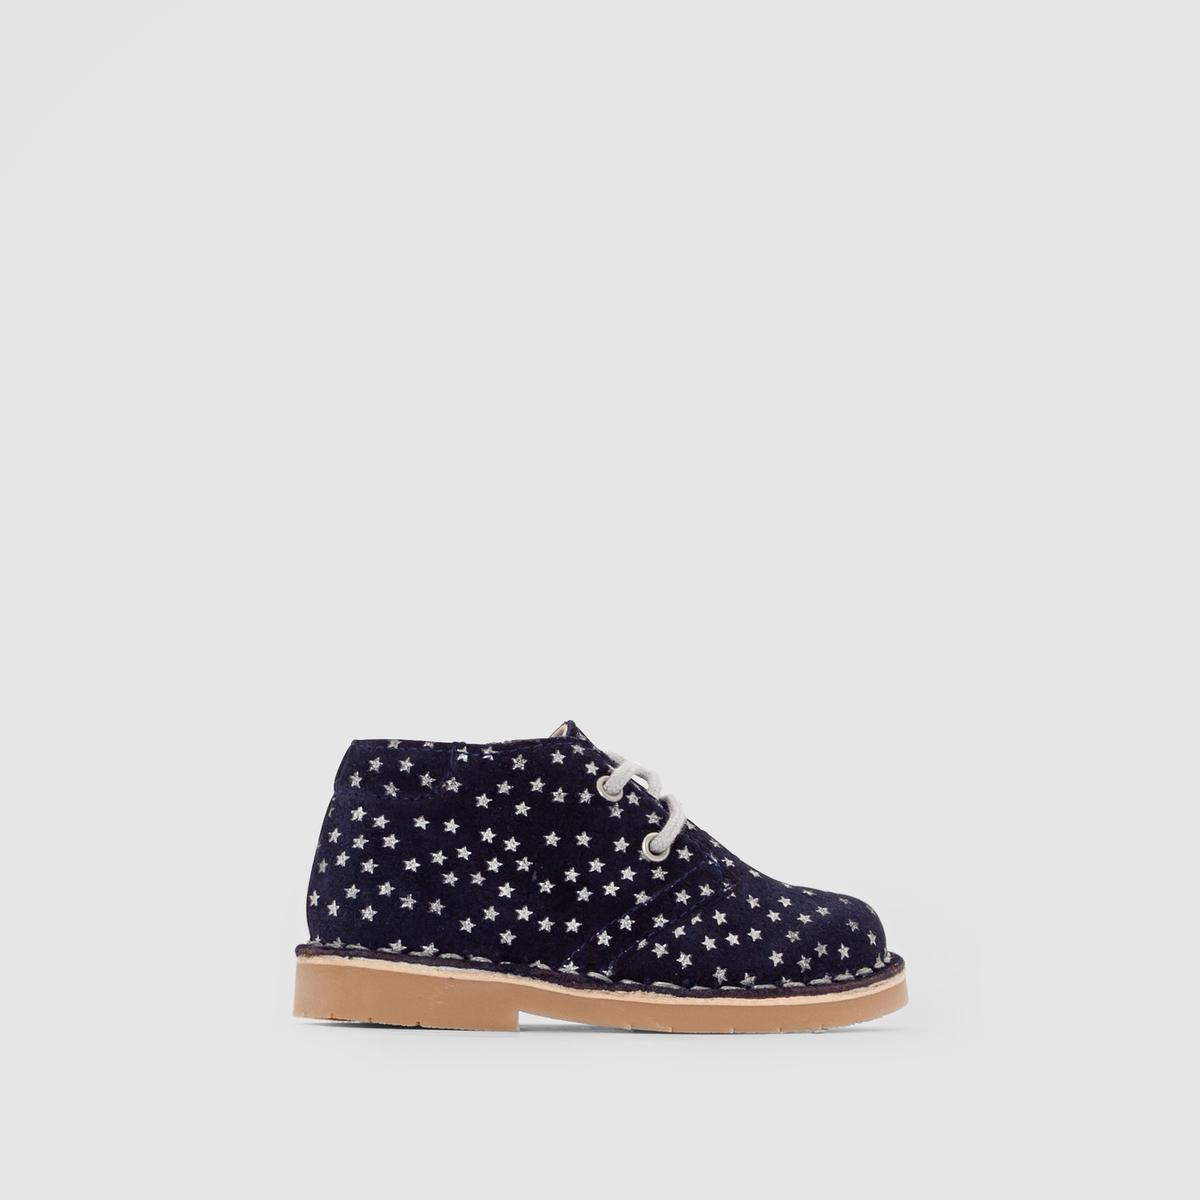 Ботинки из спилка с рисунком звезды